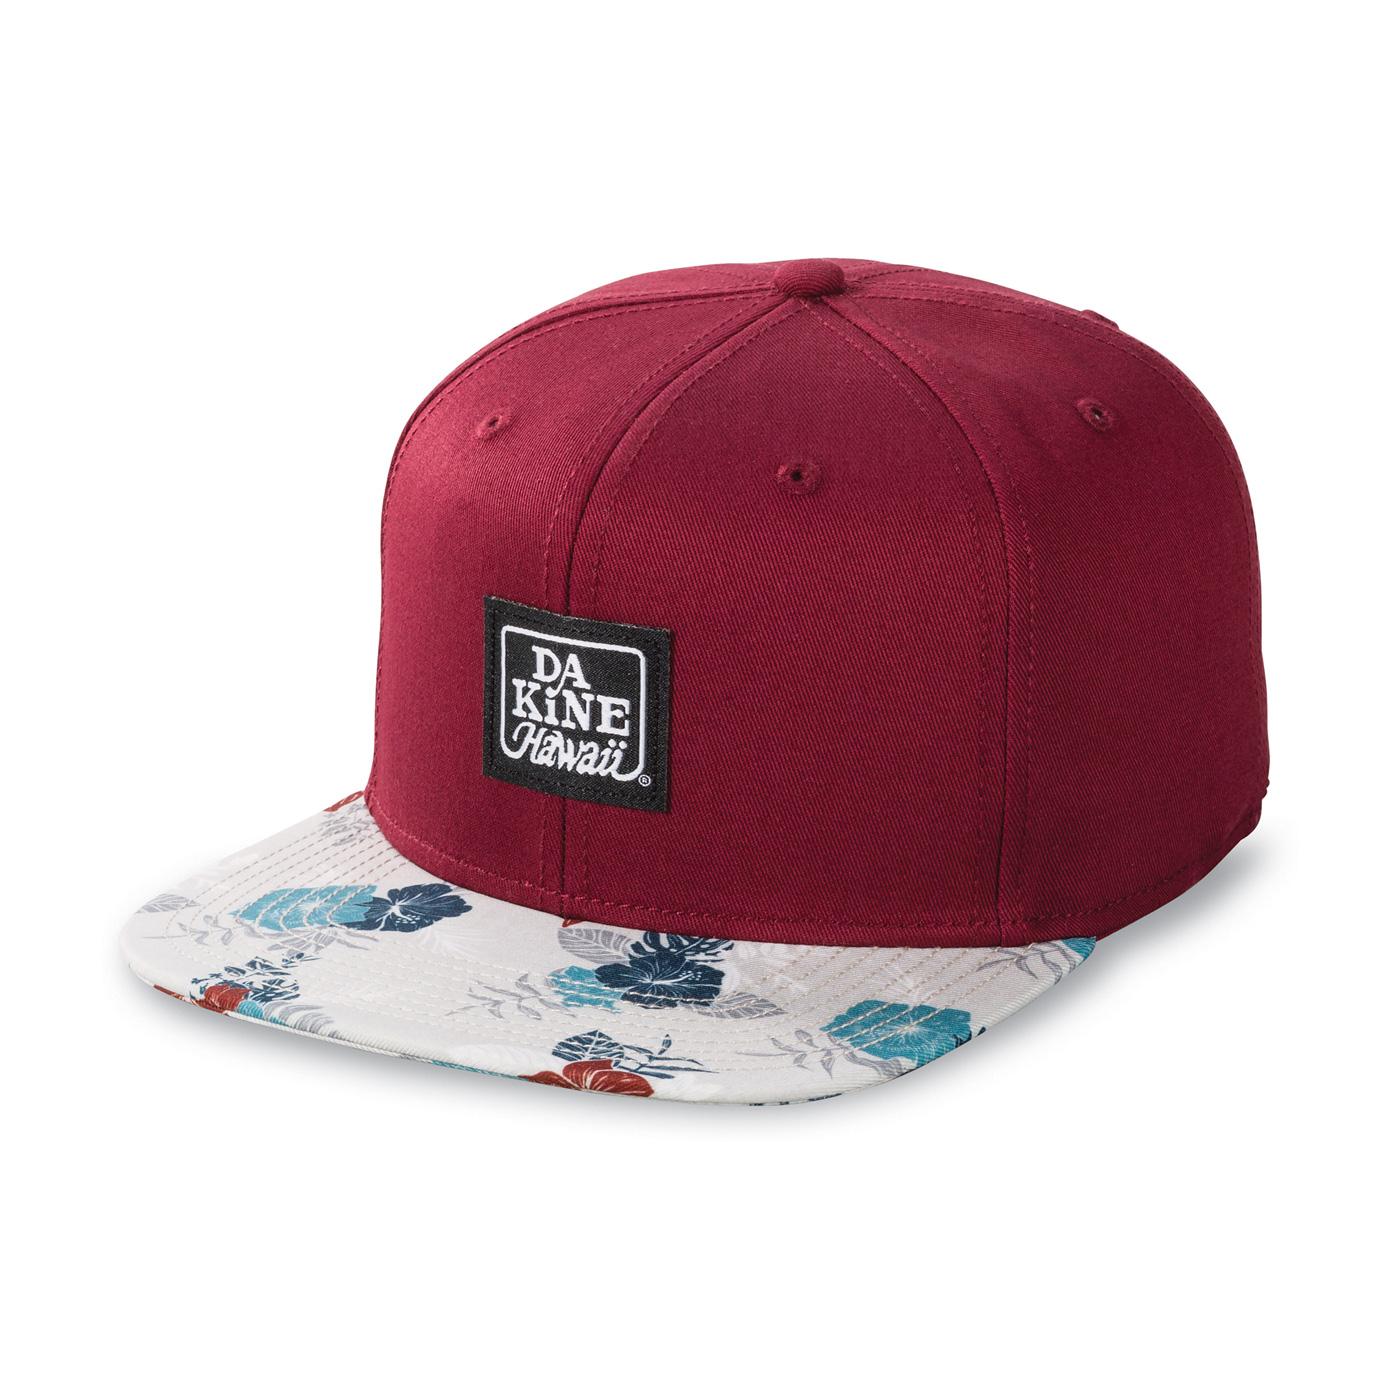 Sentinel Dakine Cap - Ano Rosewood Snap Back Hat - One Size Baseball Cap 6b1fd40255e